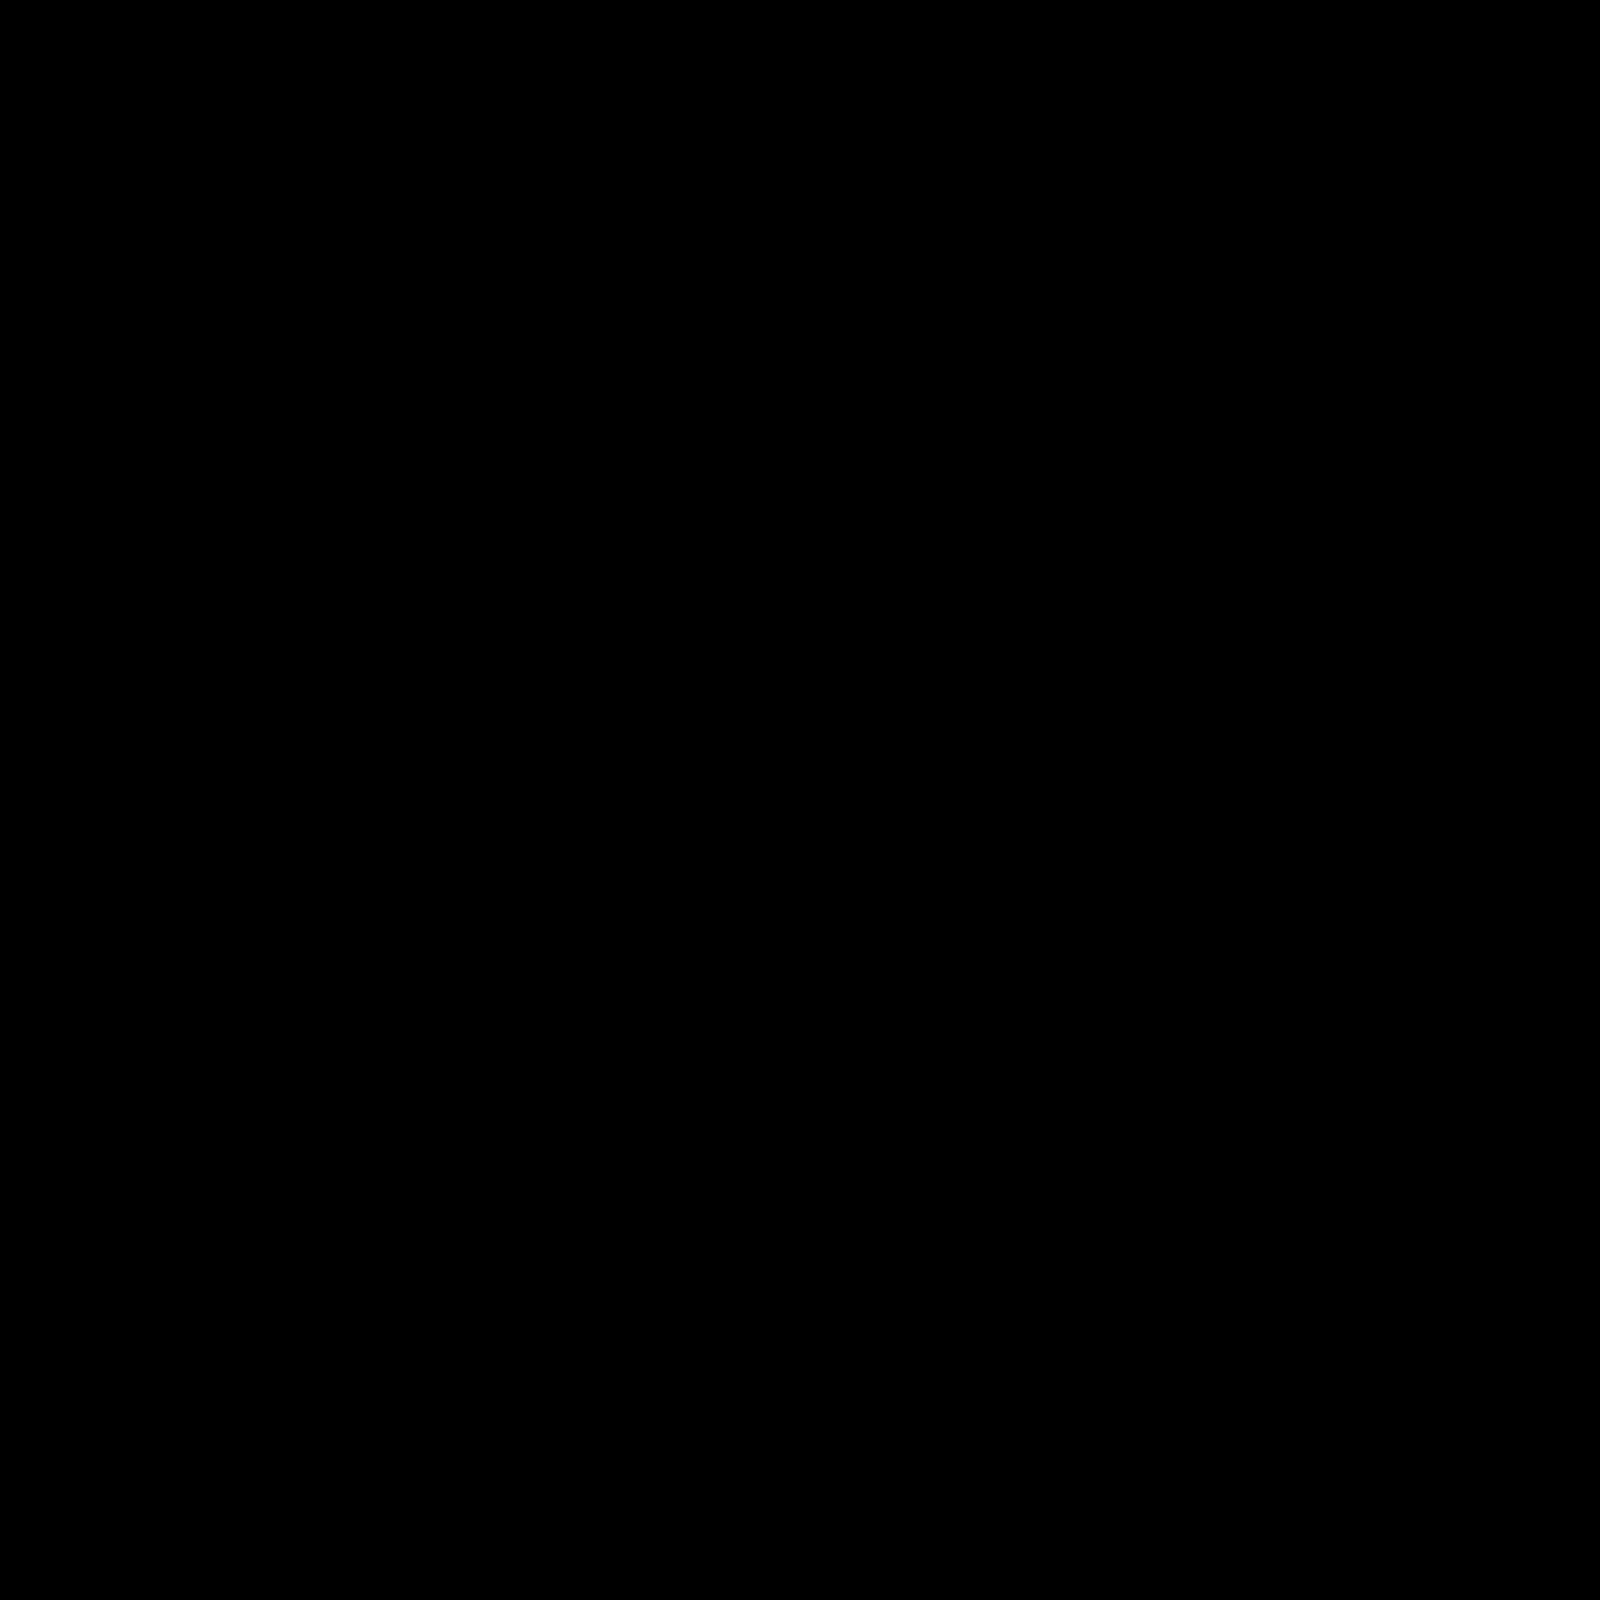 The Flash Sign Icon The Flash Logo Design Inspiration Flash Wallpaper